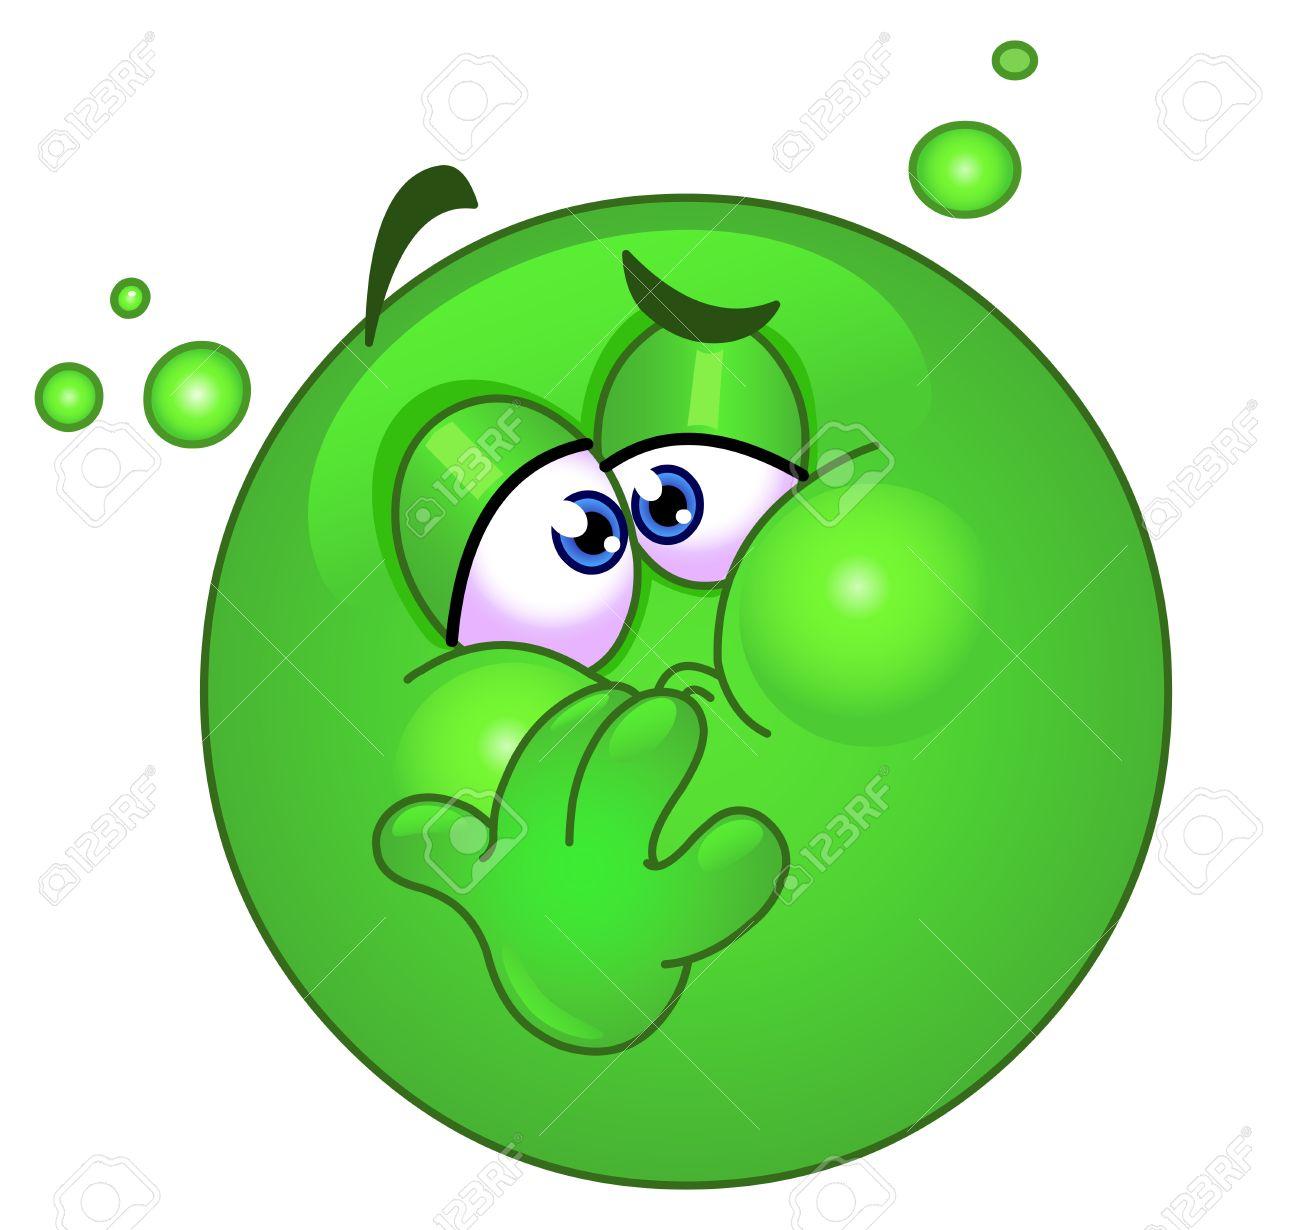 1300x1230 Sick Smiley Clipart Amp Sick Smiley Clip Art Images